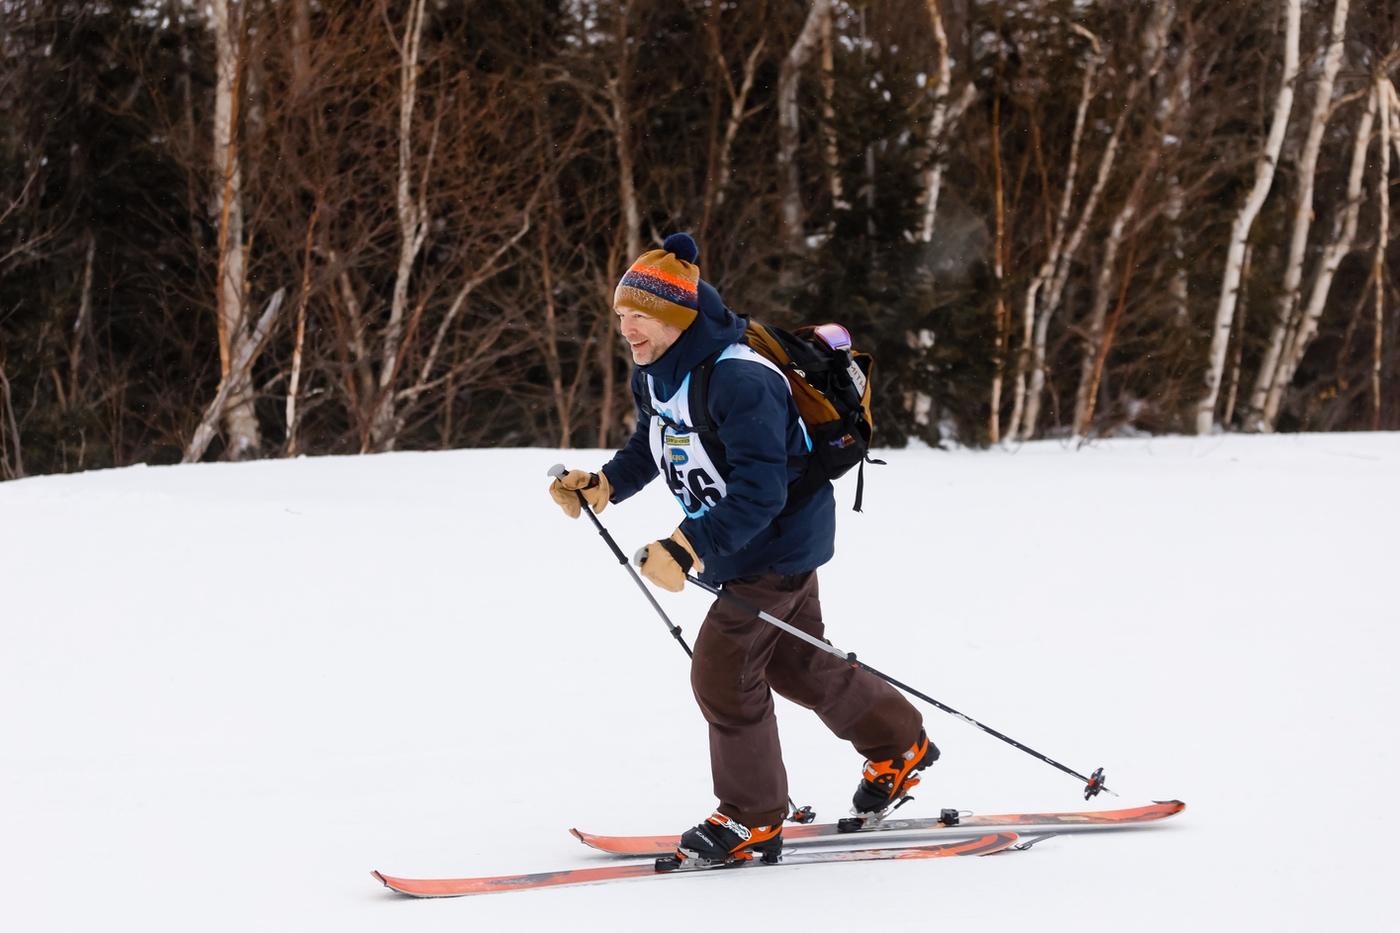 WinterKids Downhill 24 2021 SDP 3771